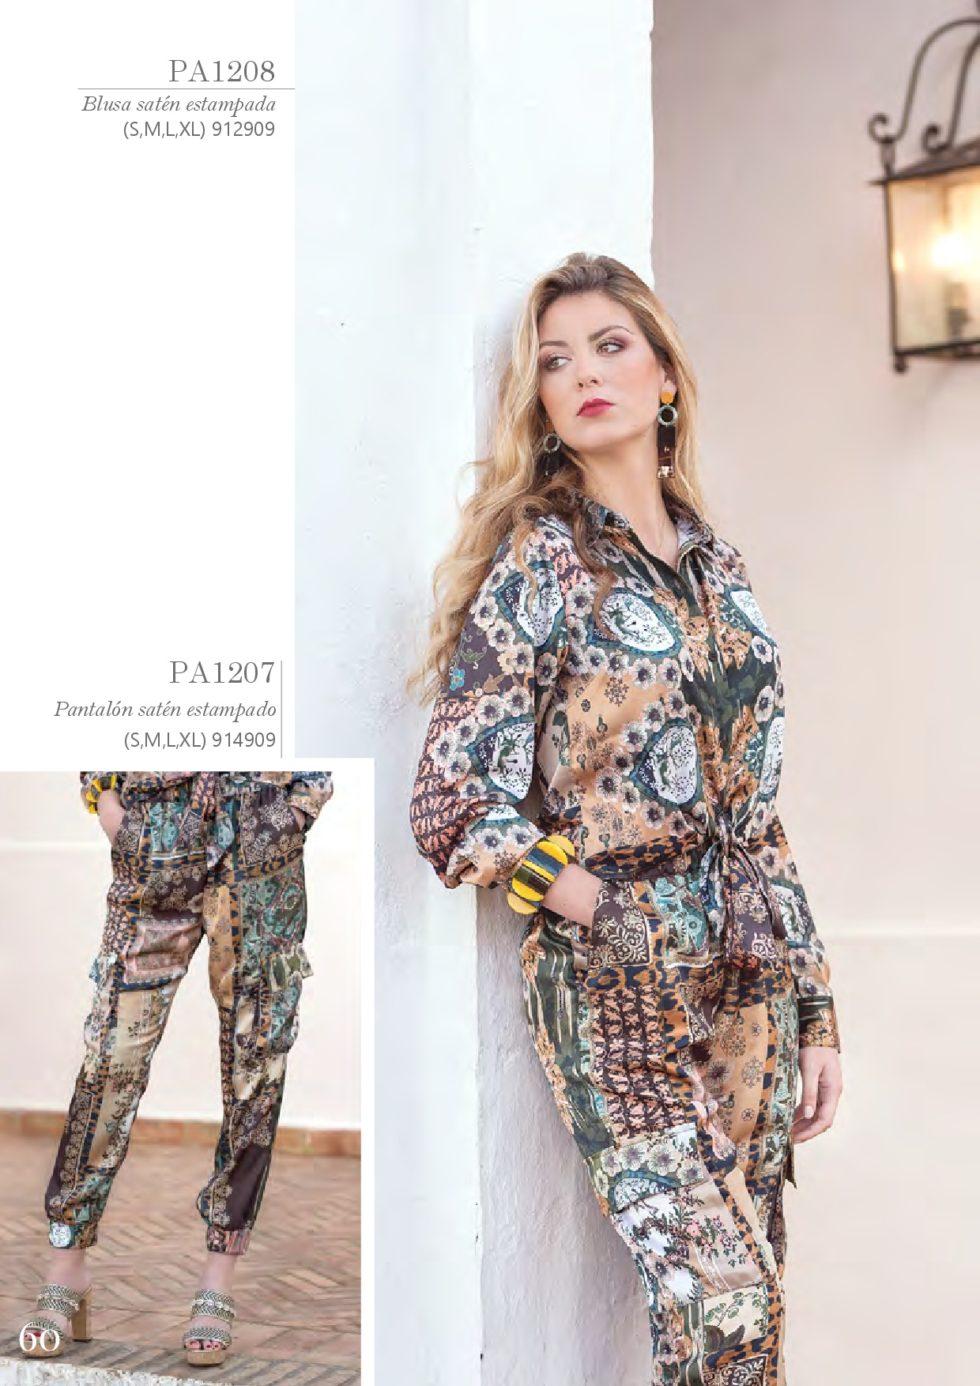 Flamenco Rosa Otoño 2021 MOD1-062